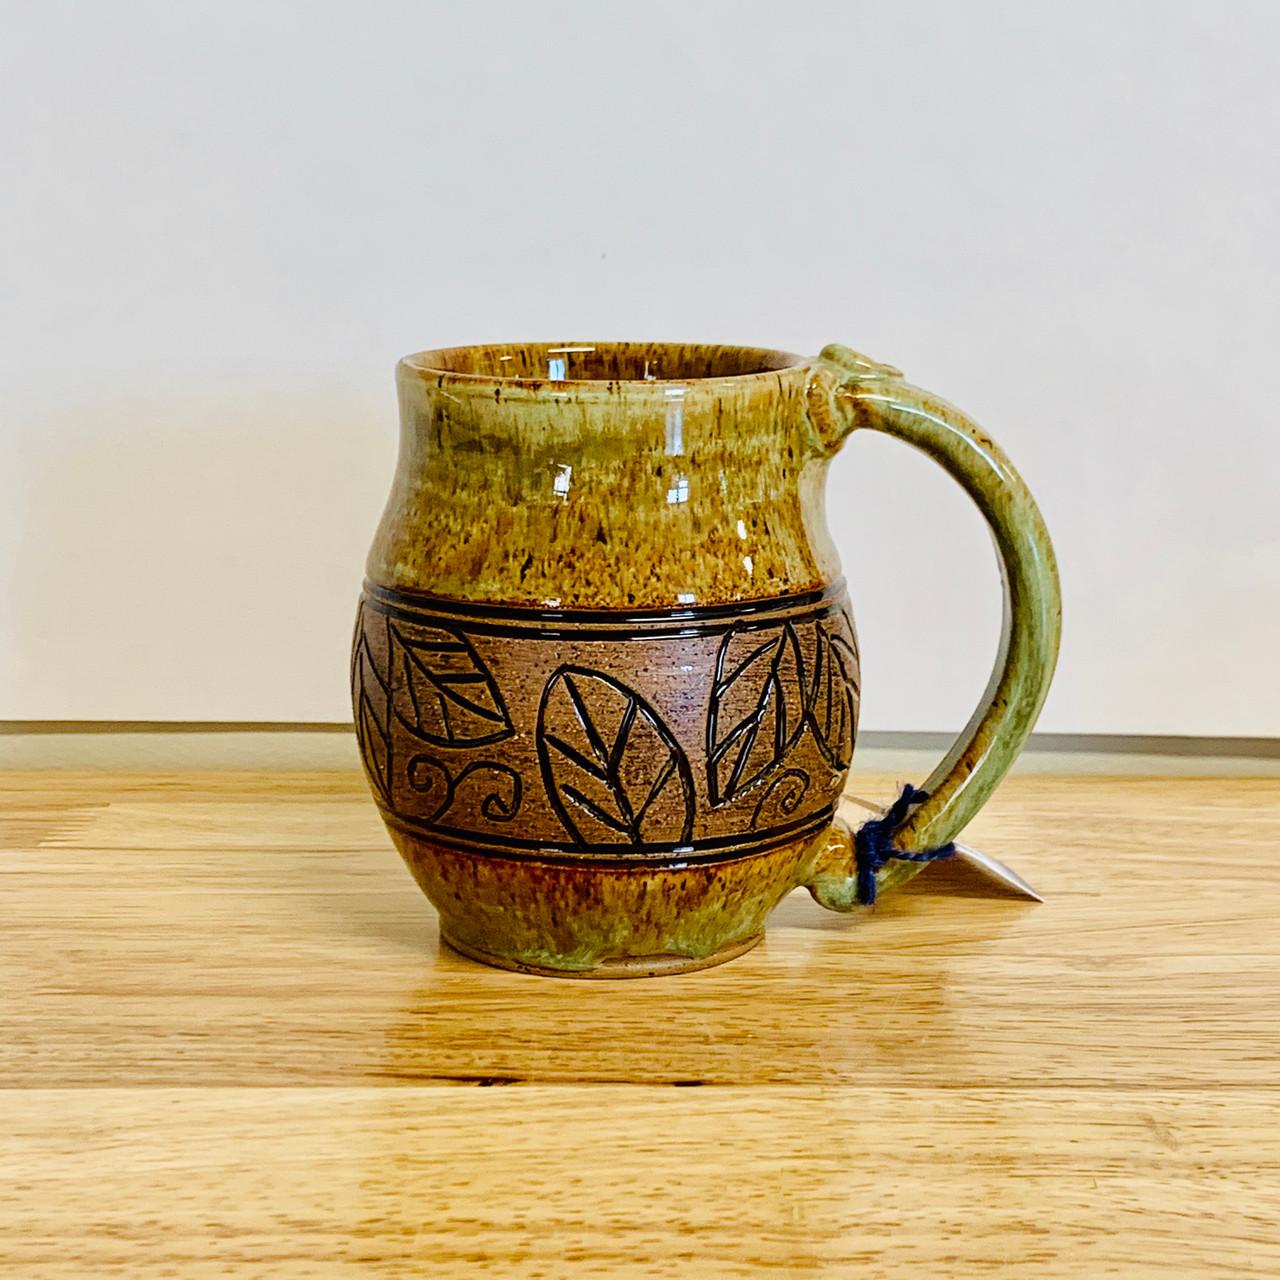 Pottery Mug With A Saying Carved Leaf Band Green 14 Oz Giftedpottery Com